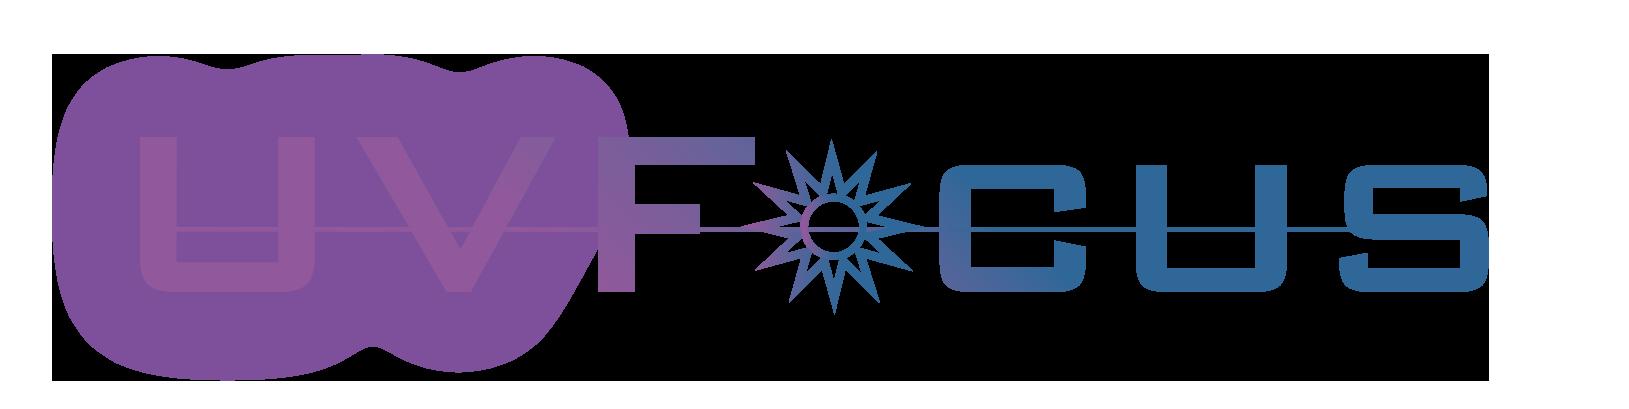 UVFocus_Logov2 Gradient with LF Blue